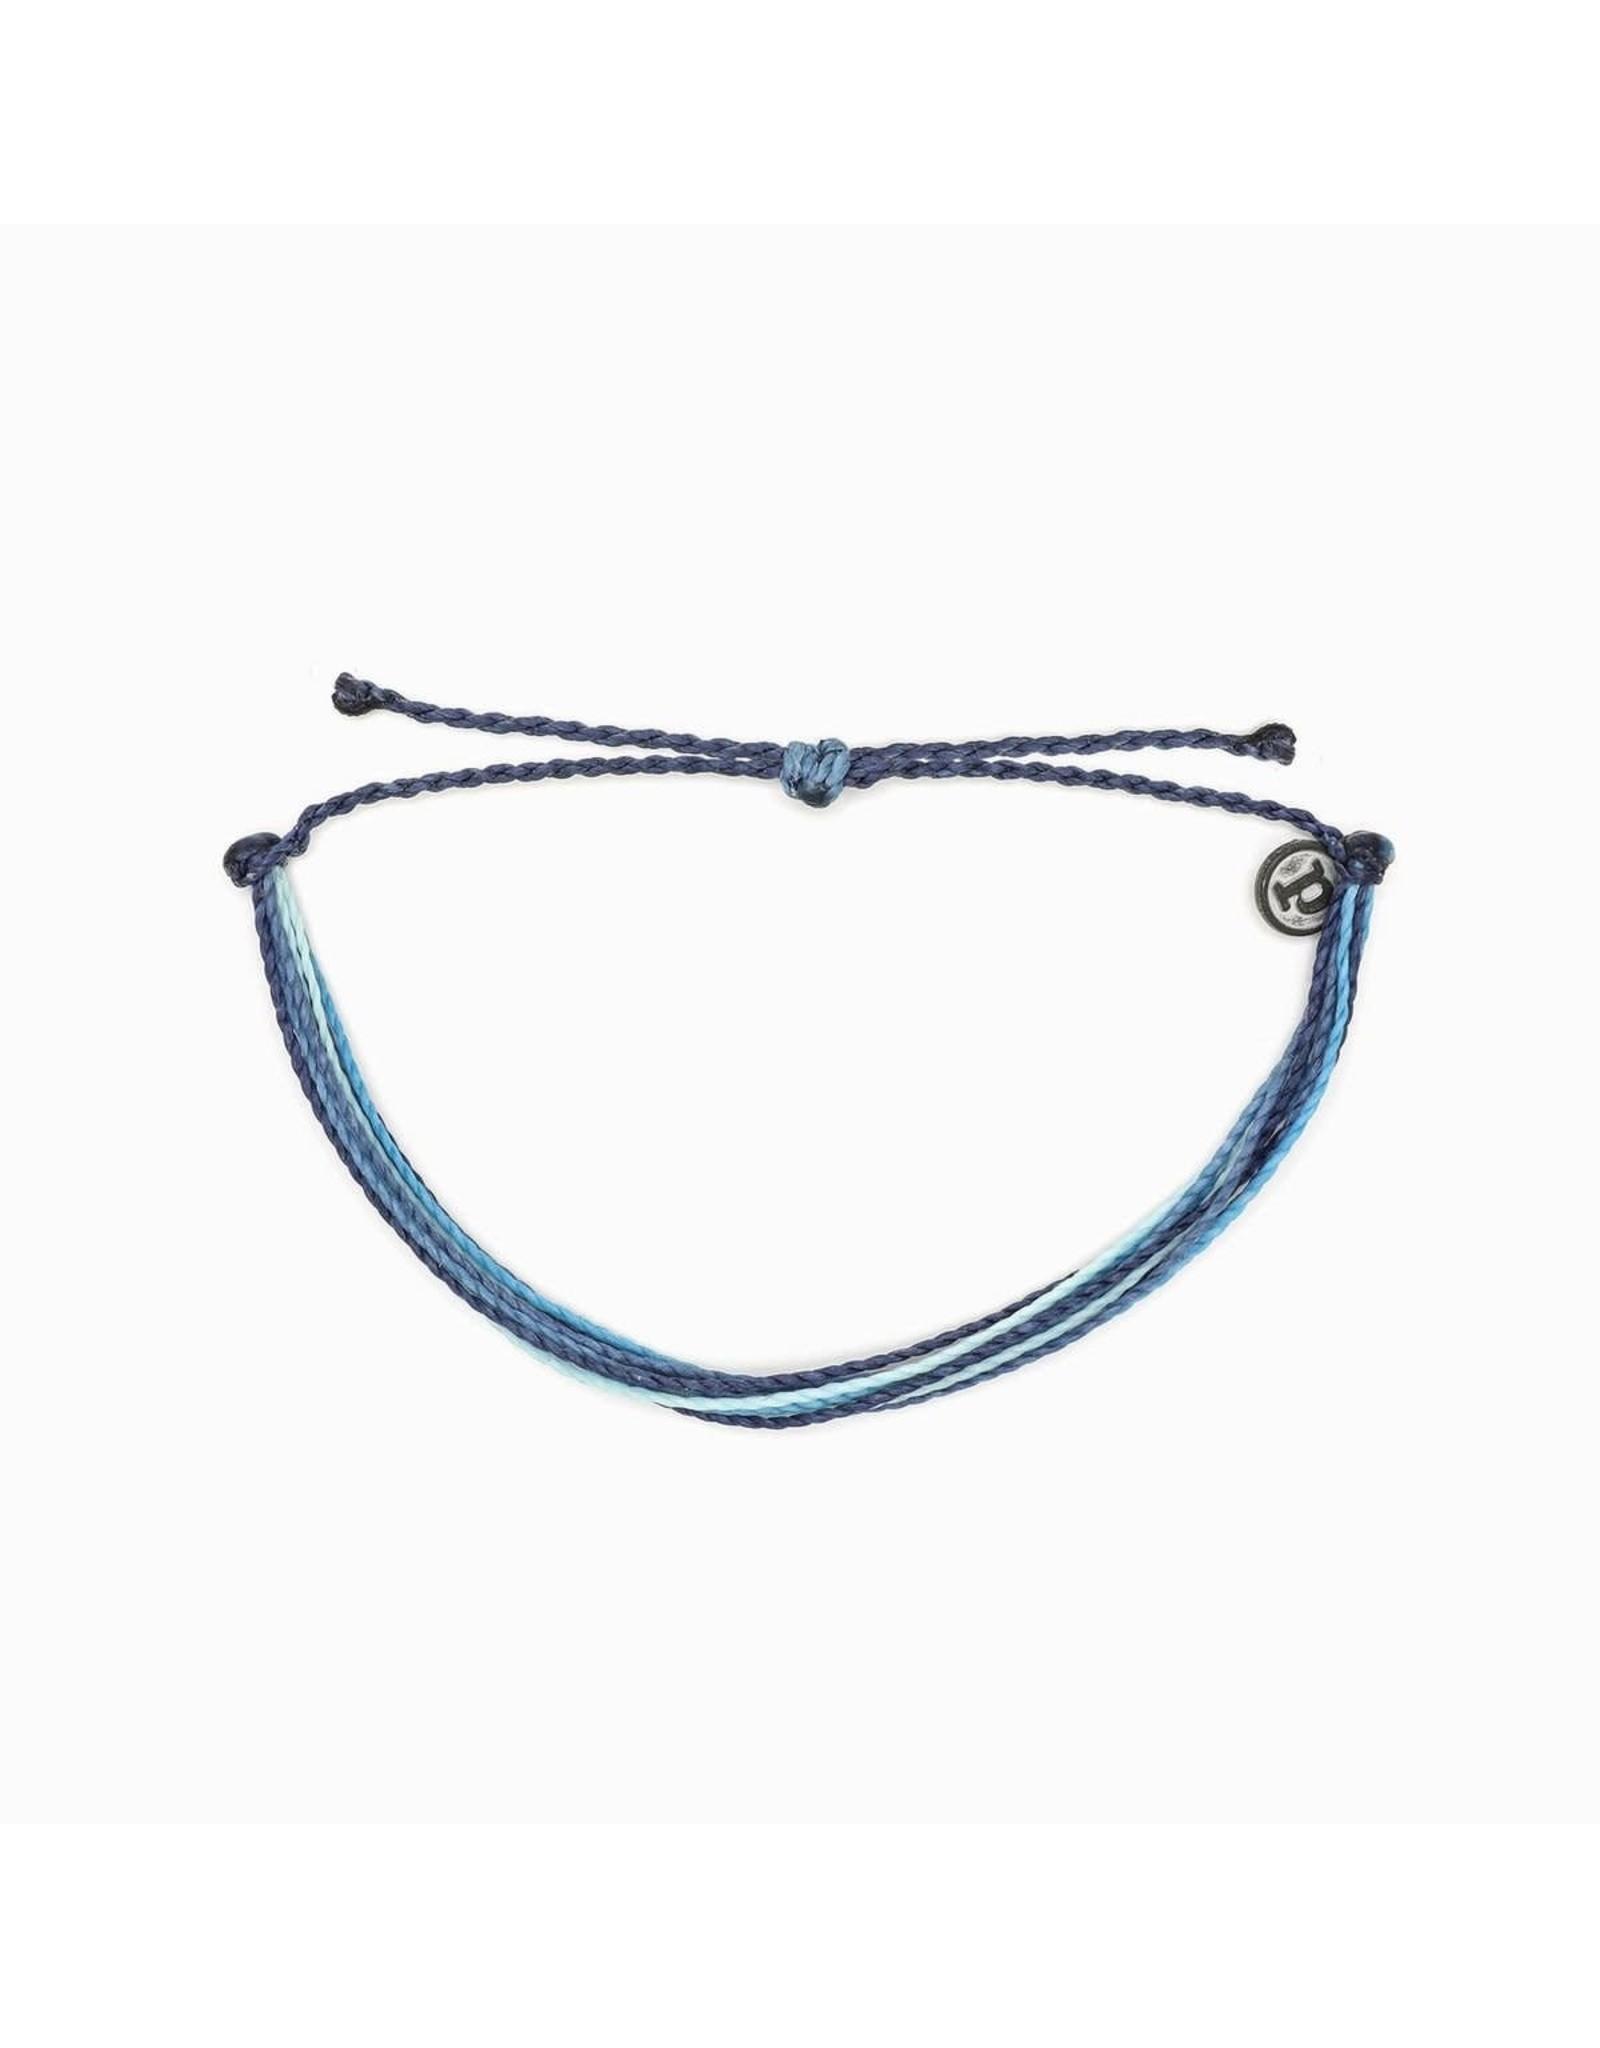 Puravida Bracelets Charity Original Surfrider